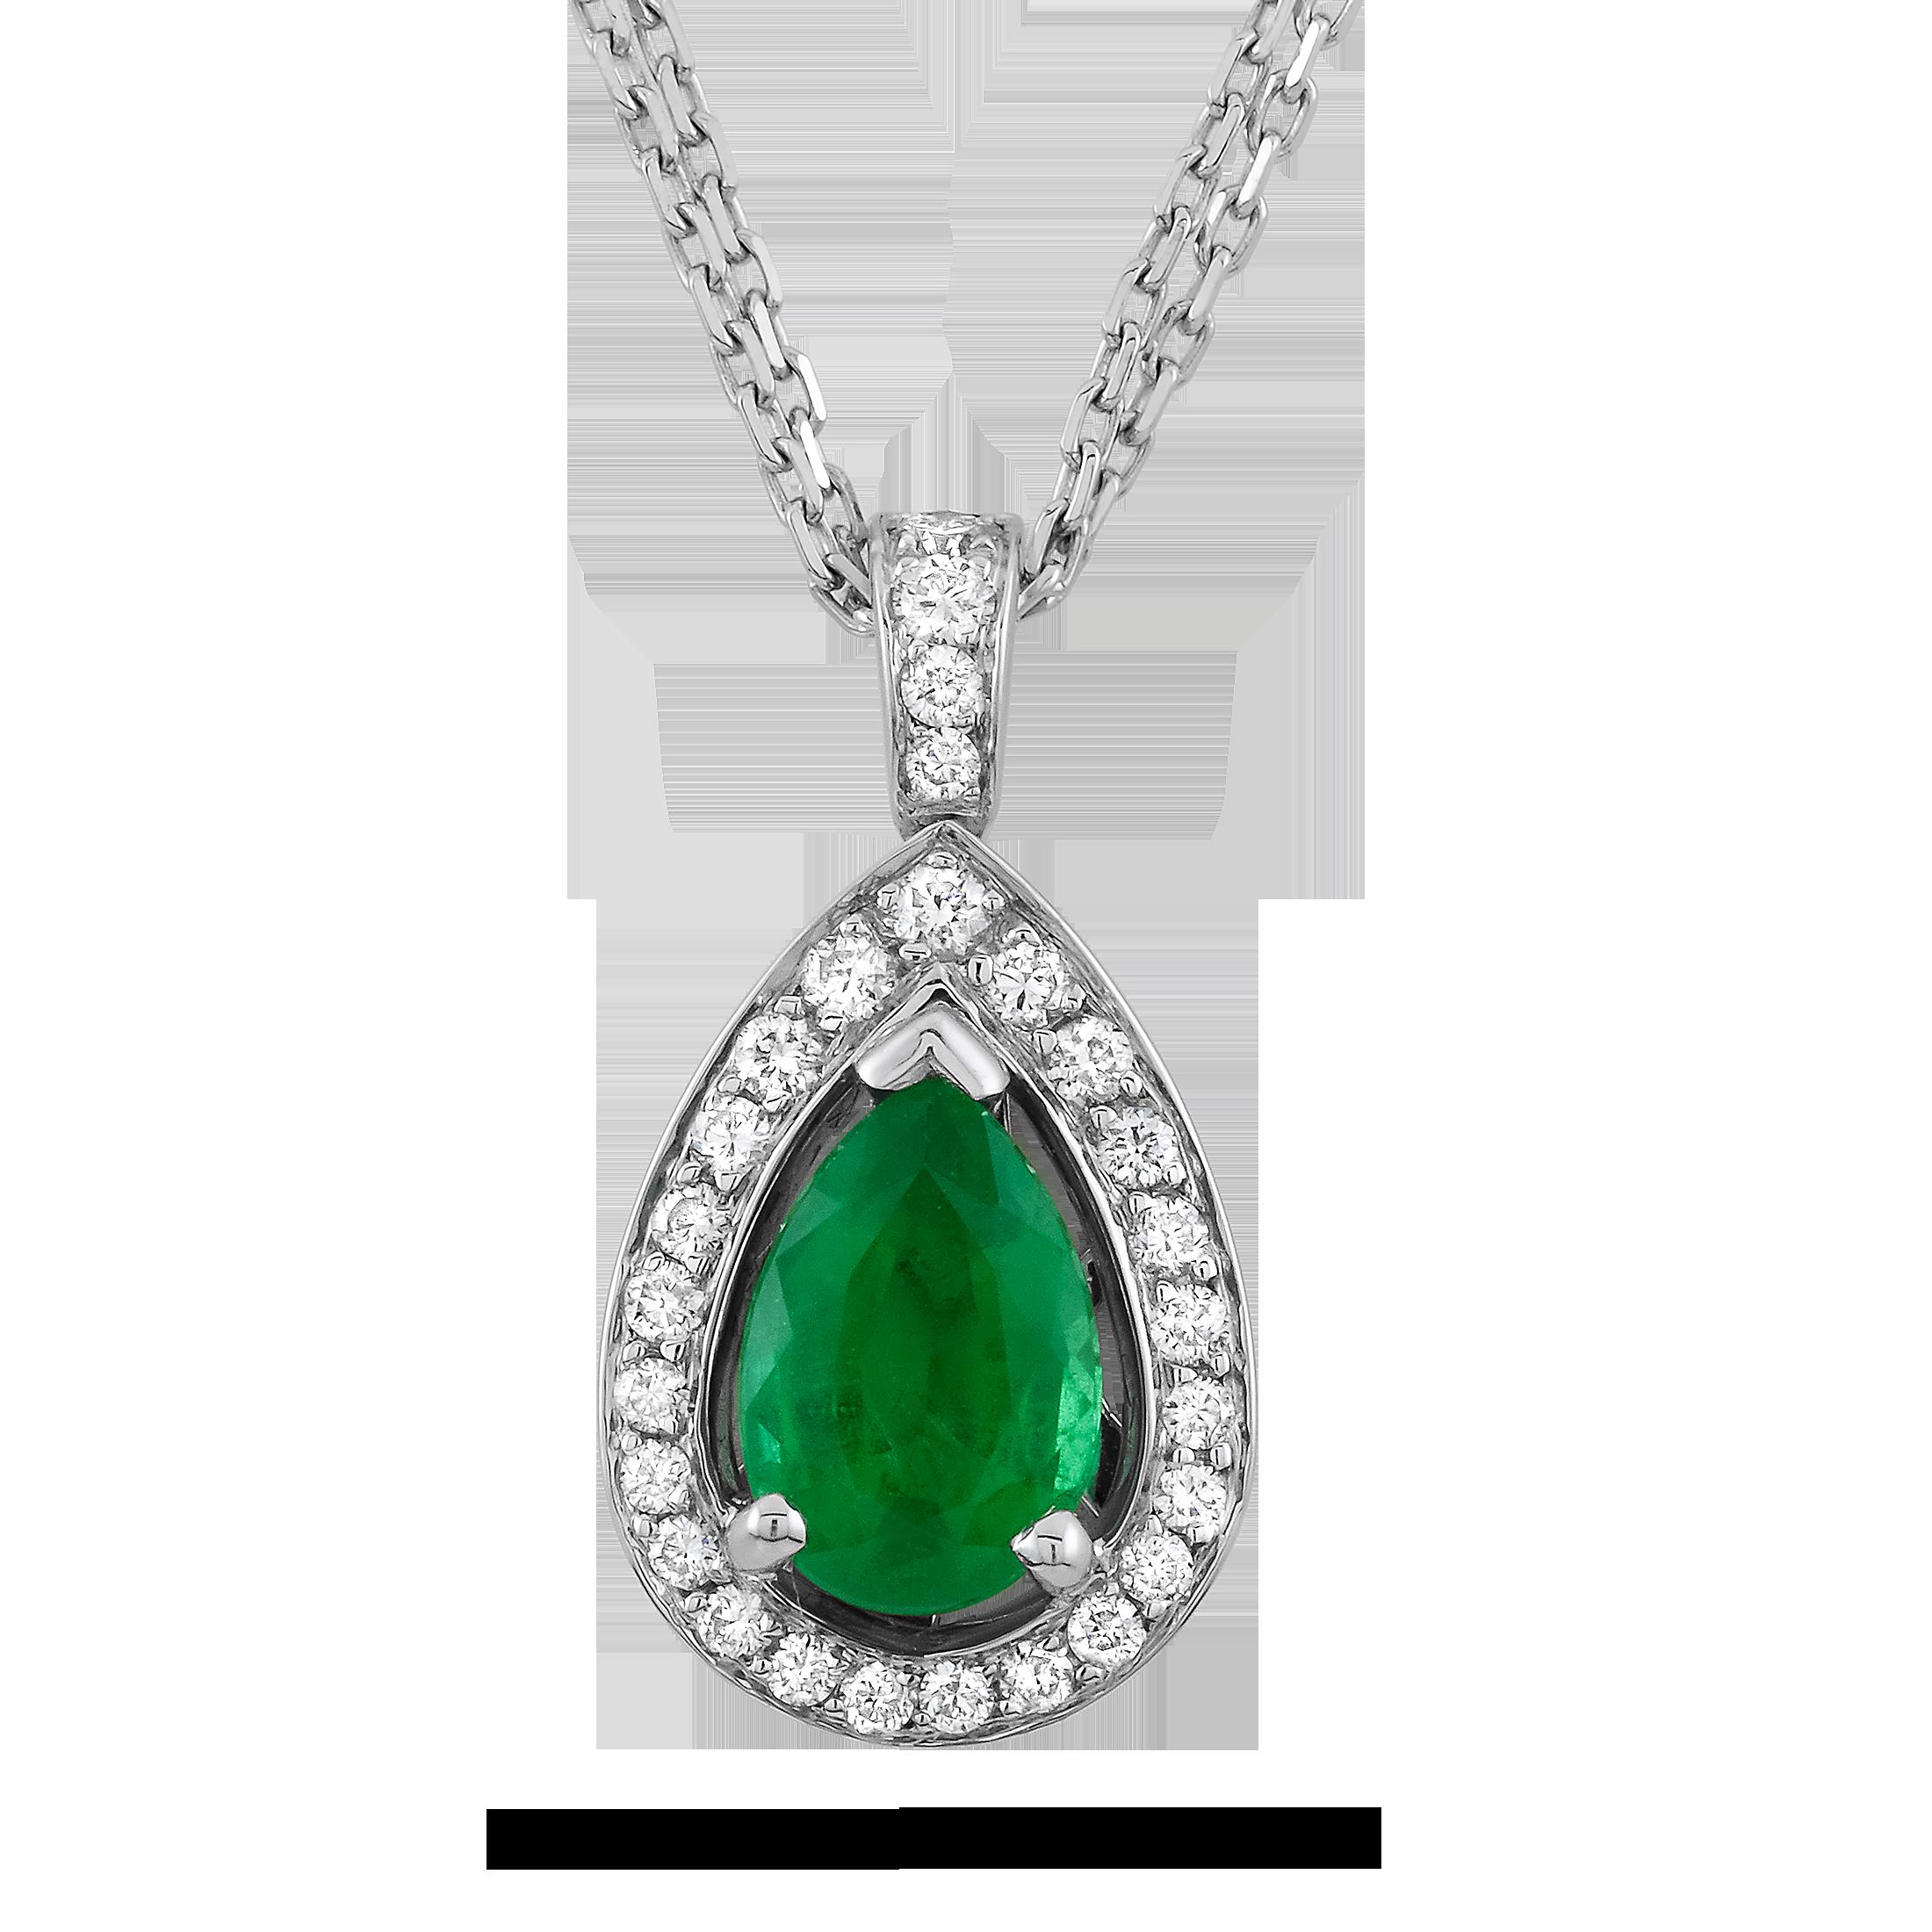 Emerald clipart diamond Necklace WG Emerald 00 &